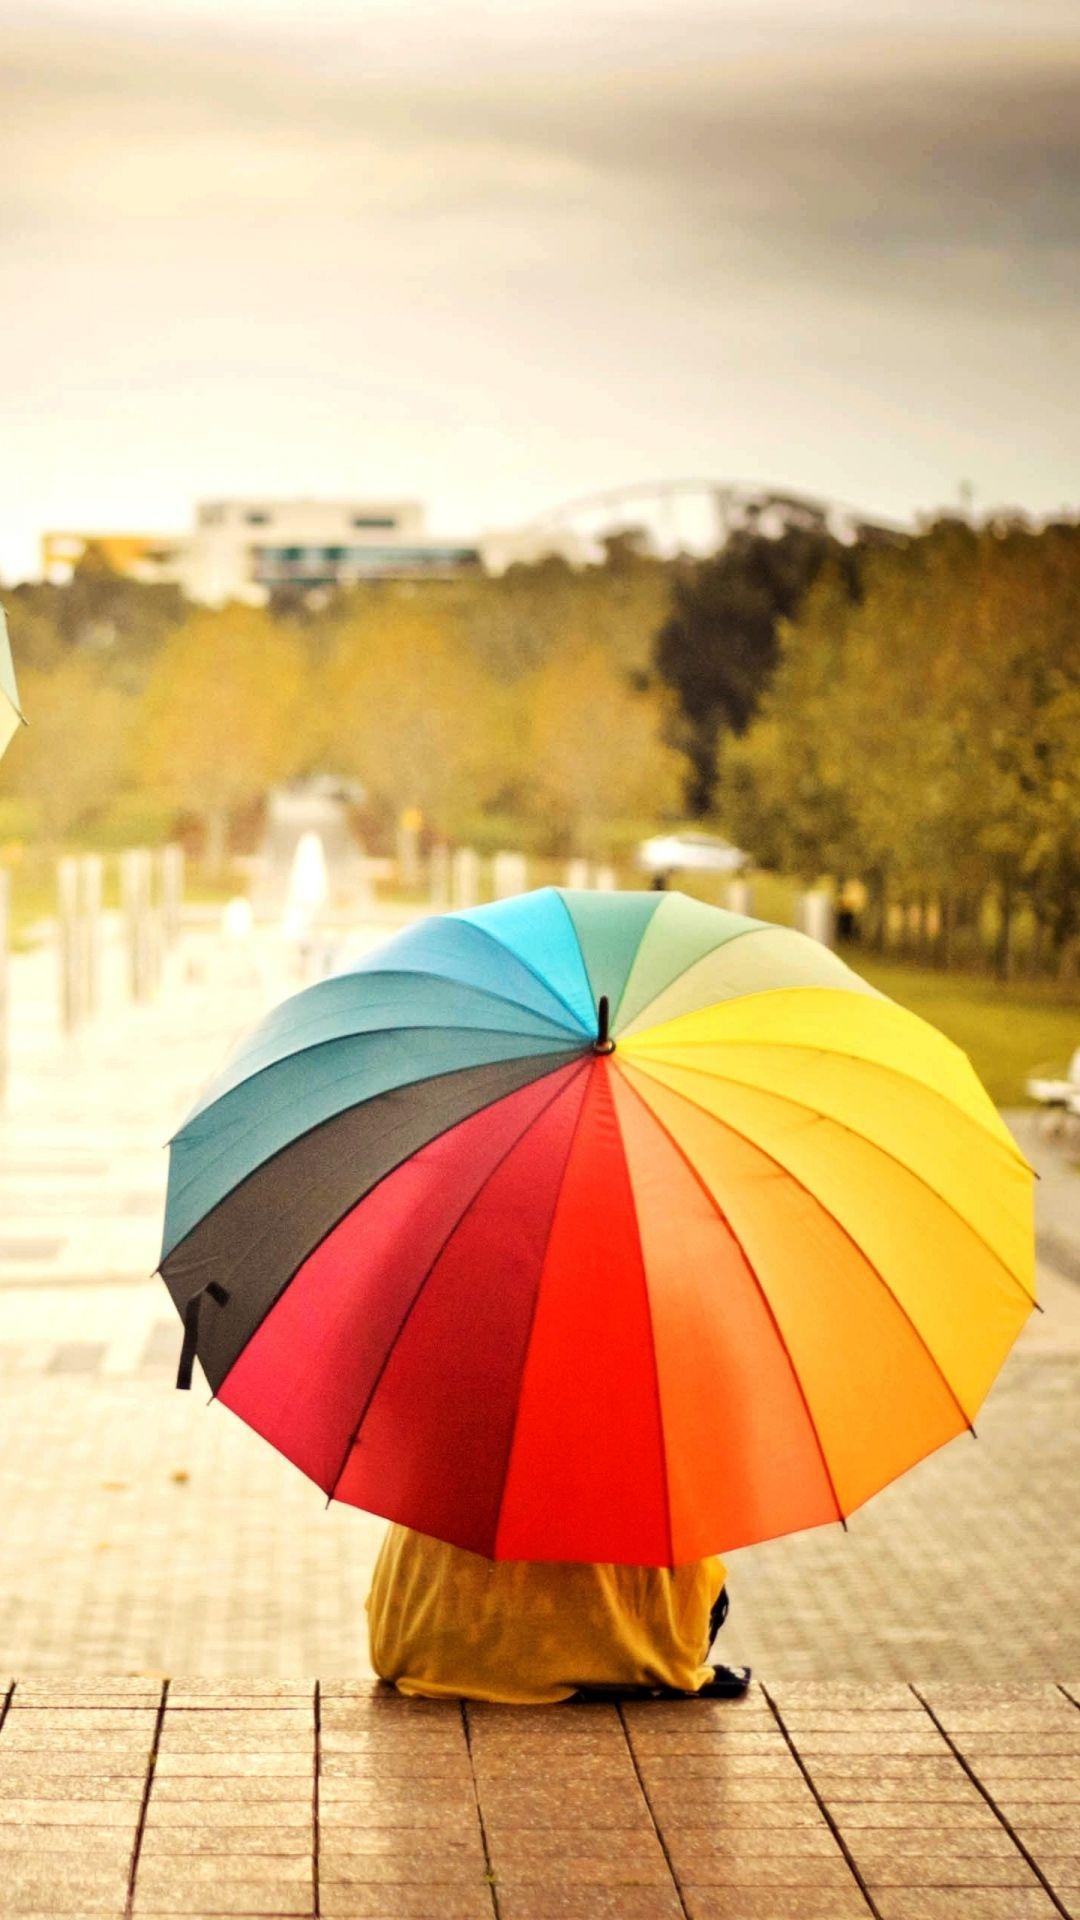 Wallpaper iphone umbrella - Colorful Umbrellas Kids Rainbow Weather Mood Iphone 6 Plus Wallpaper